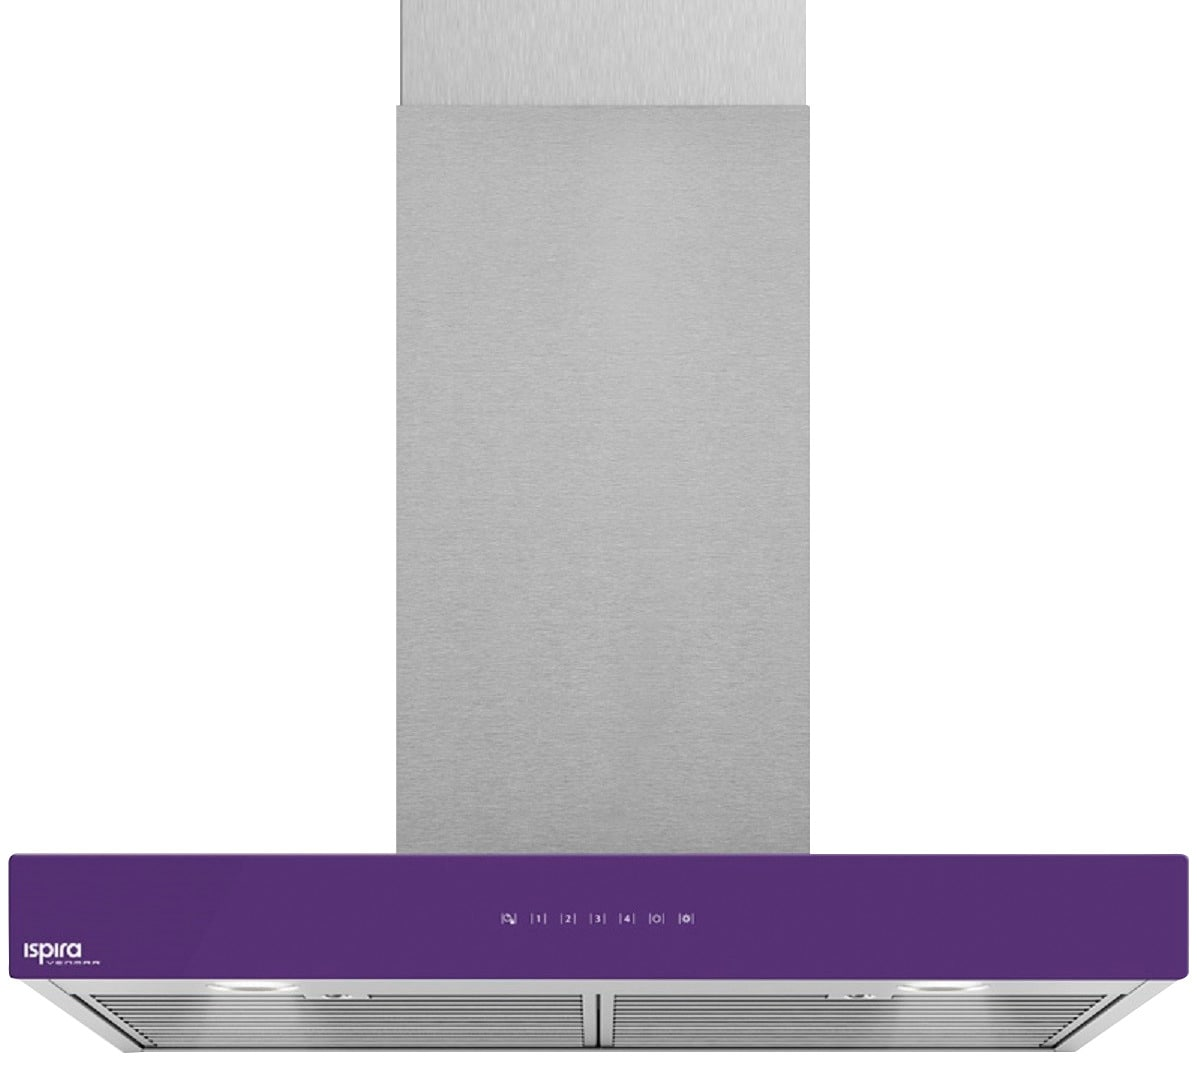 Hotte cheminée Venmar Ispira de 36 po – violette